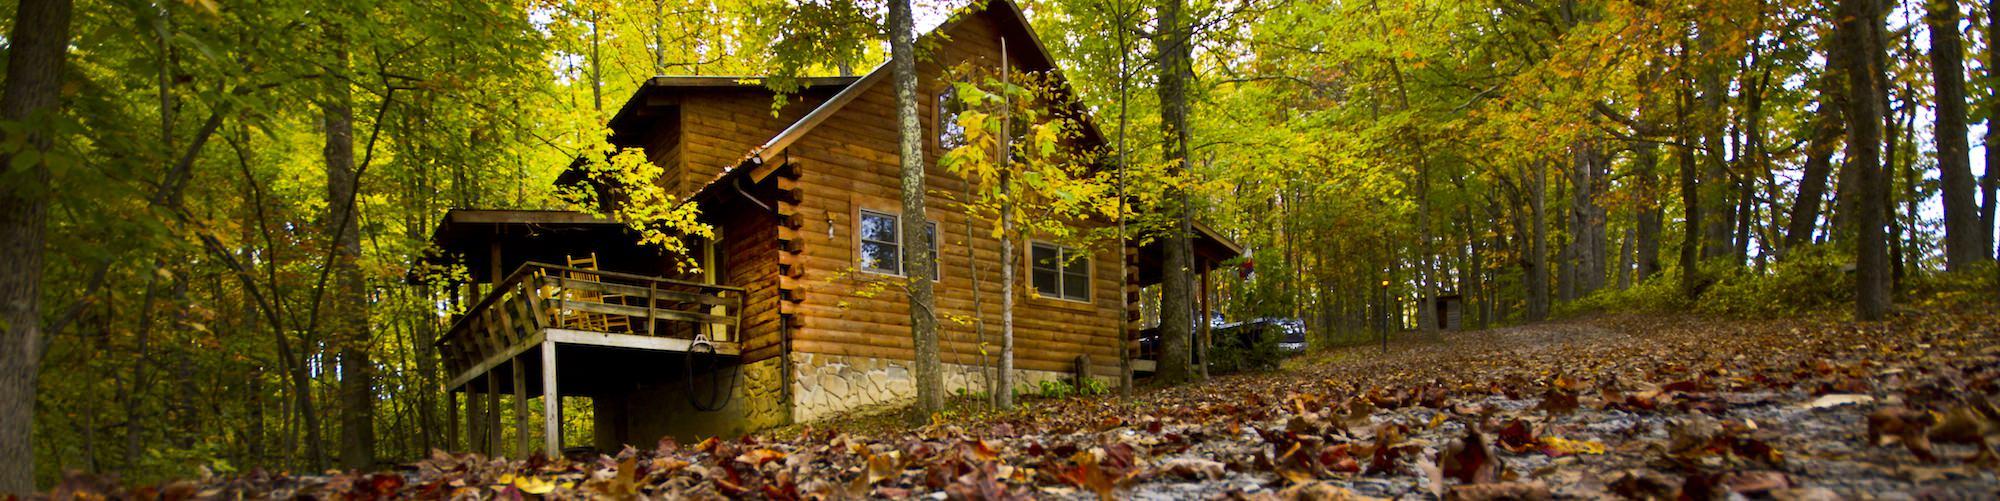 Lost Island Cabin Rentals